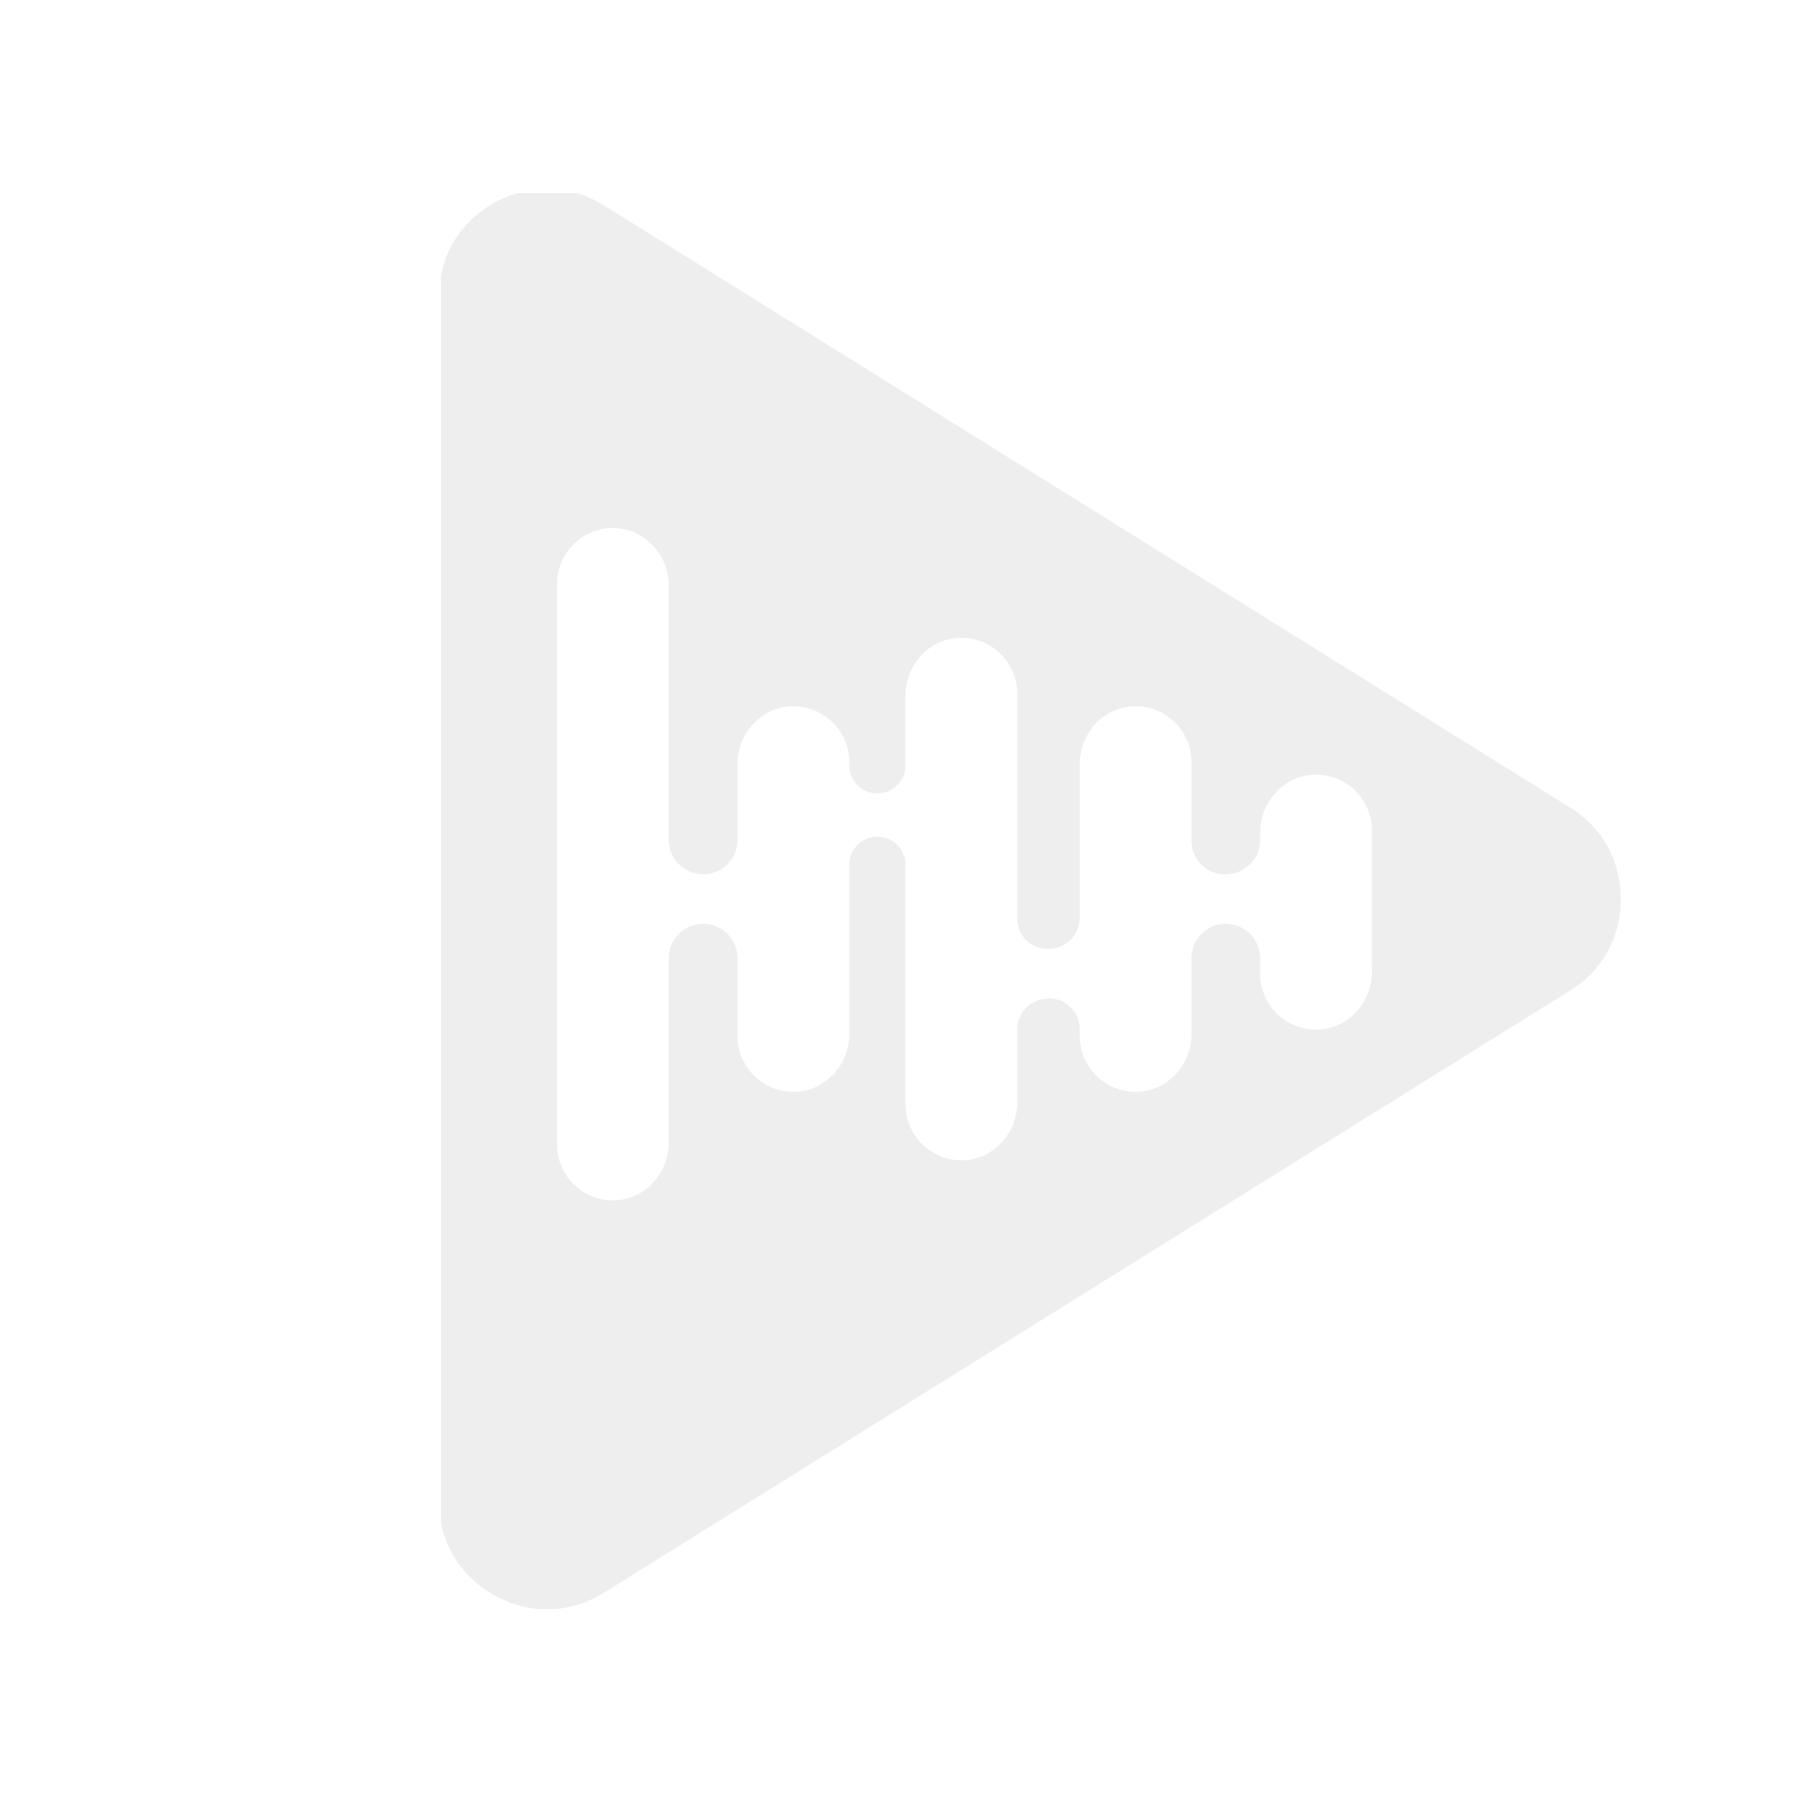 Kufatec Fistune 40150-1